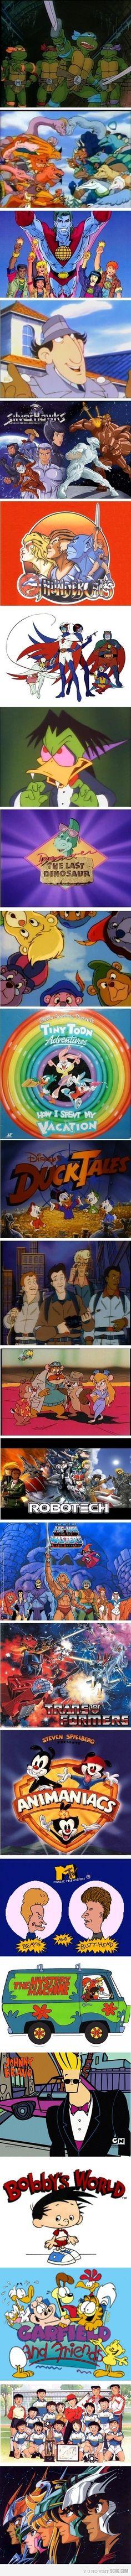 my 80's cartoons!